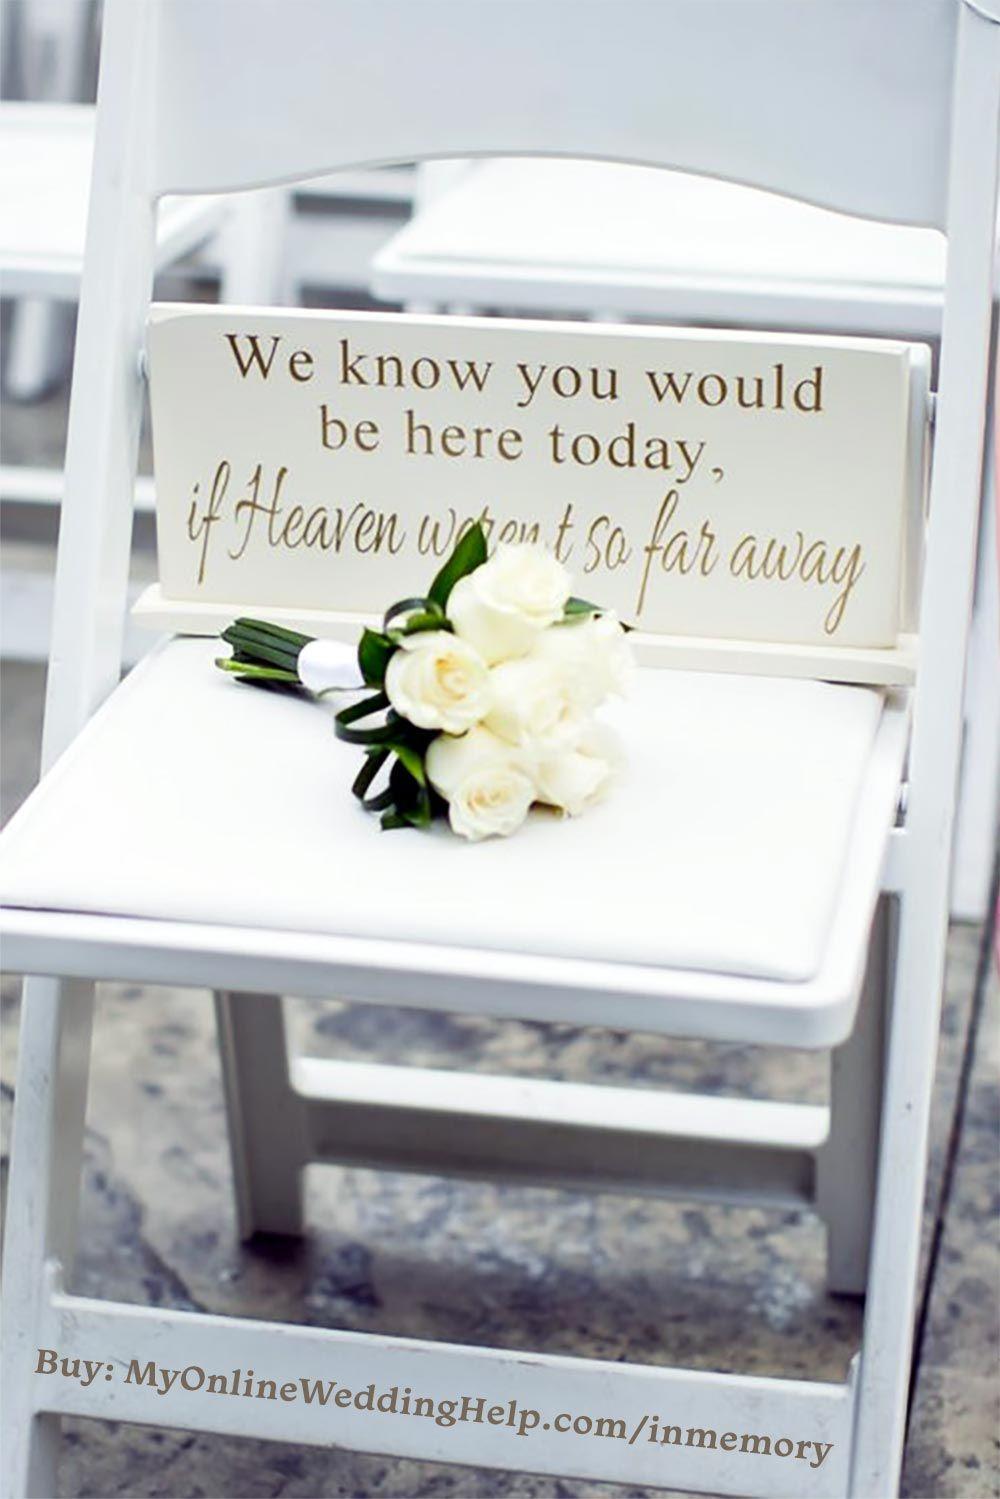 In Memorial Memory Decor (Page 1 of 1) | Wedding Products from MyOnlineWeddingHelp.com on MyOnlineWeddingHelp.com